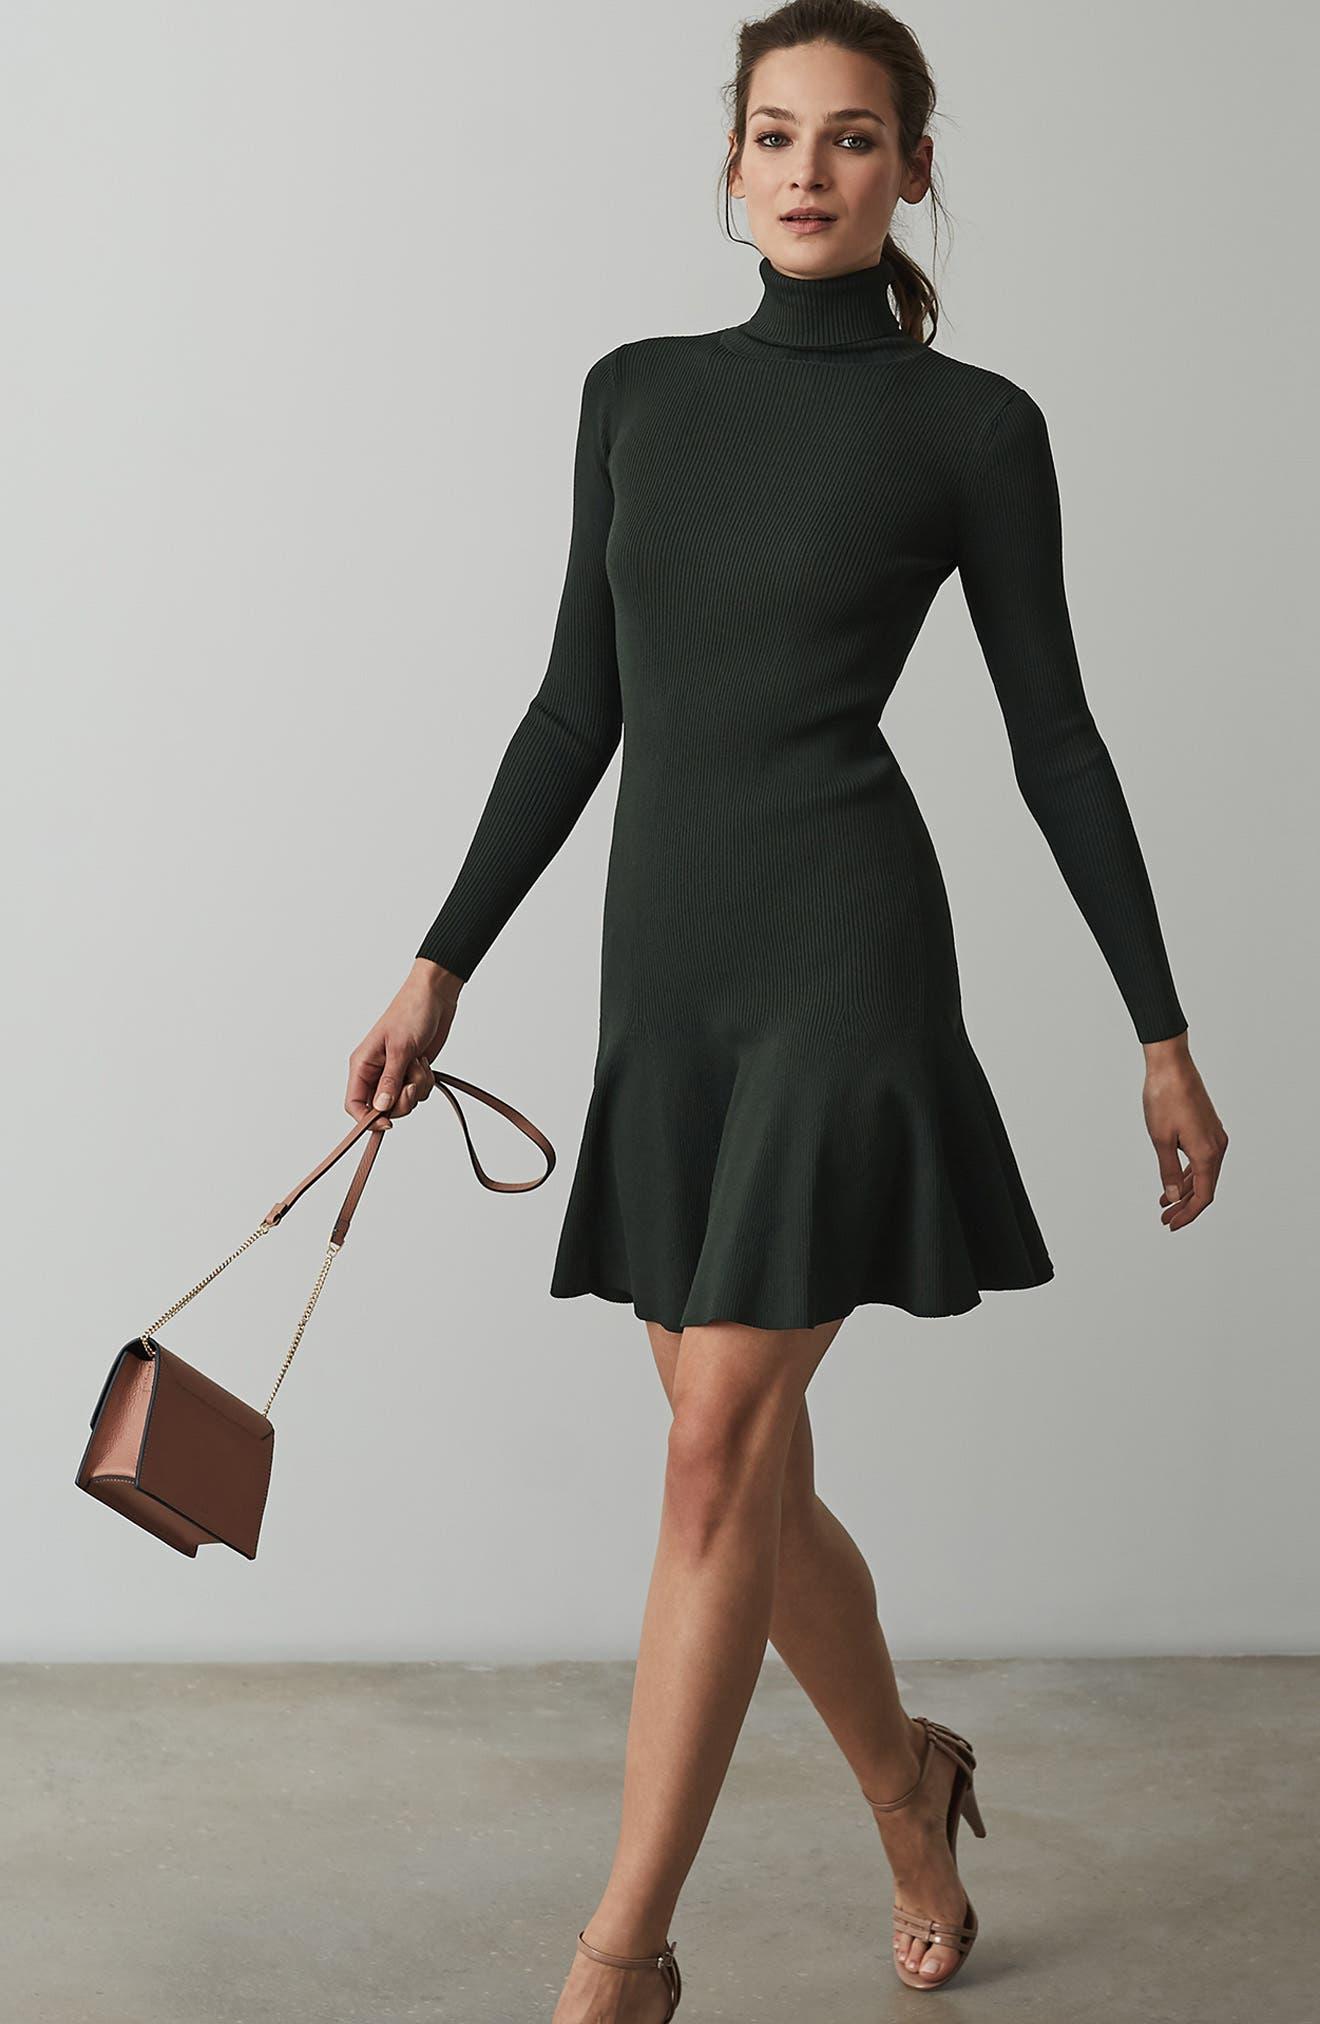 REISS,                             Mimi Turtleneck Sweater Dress,                             Alternate thumbnail 5, color,                             GREEN